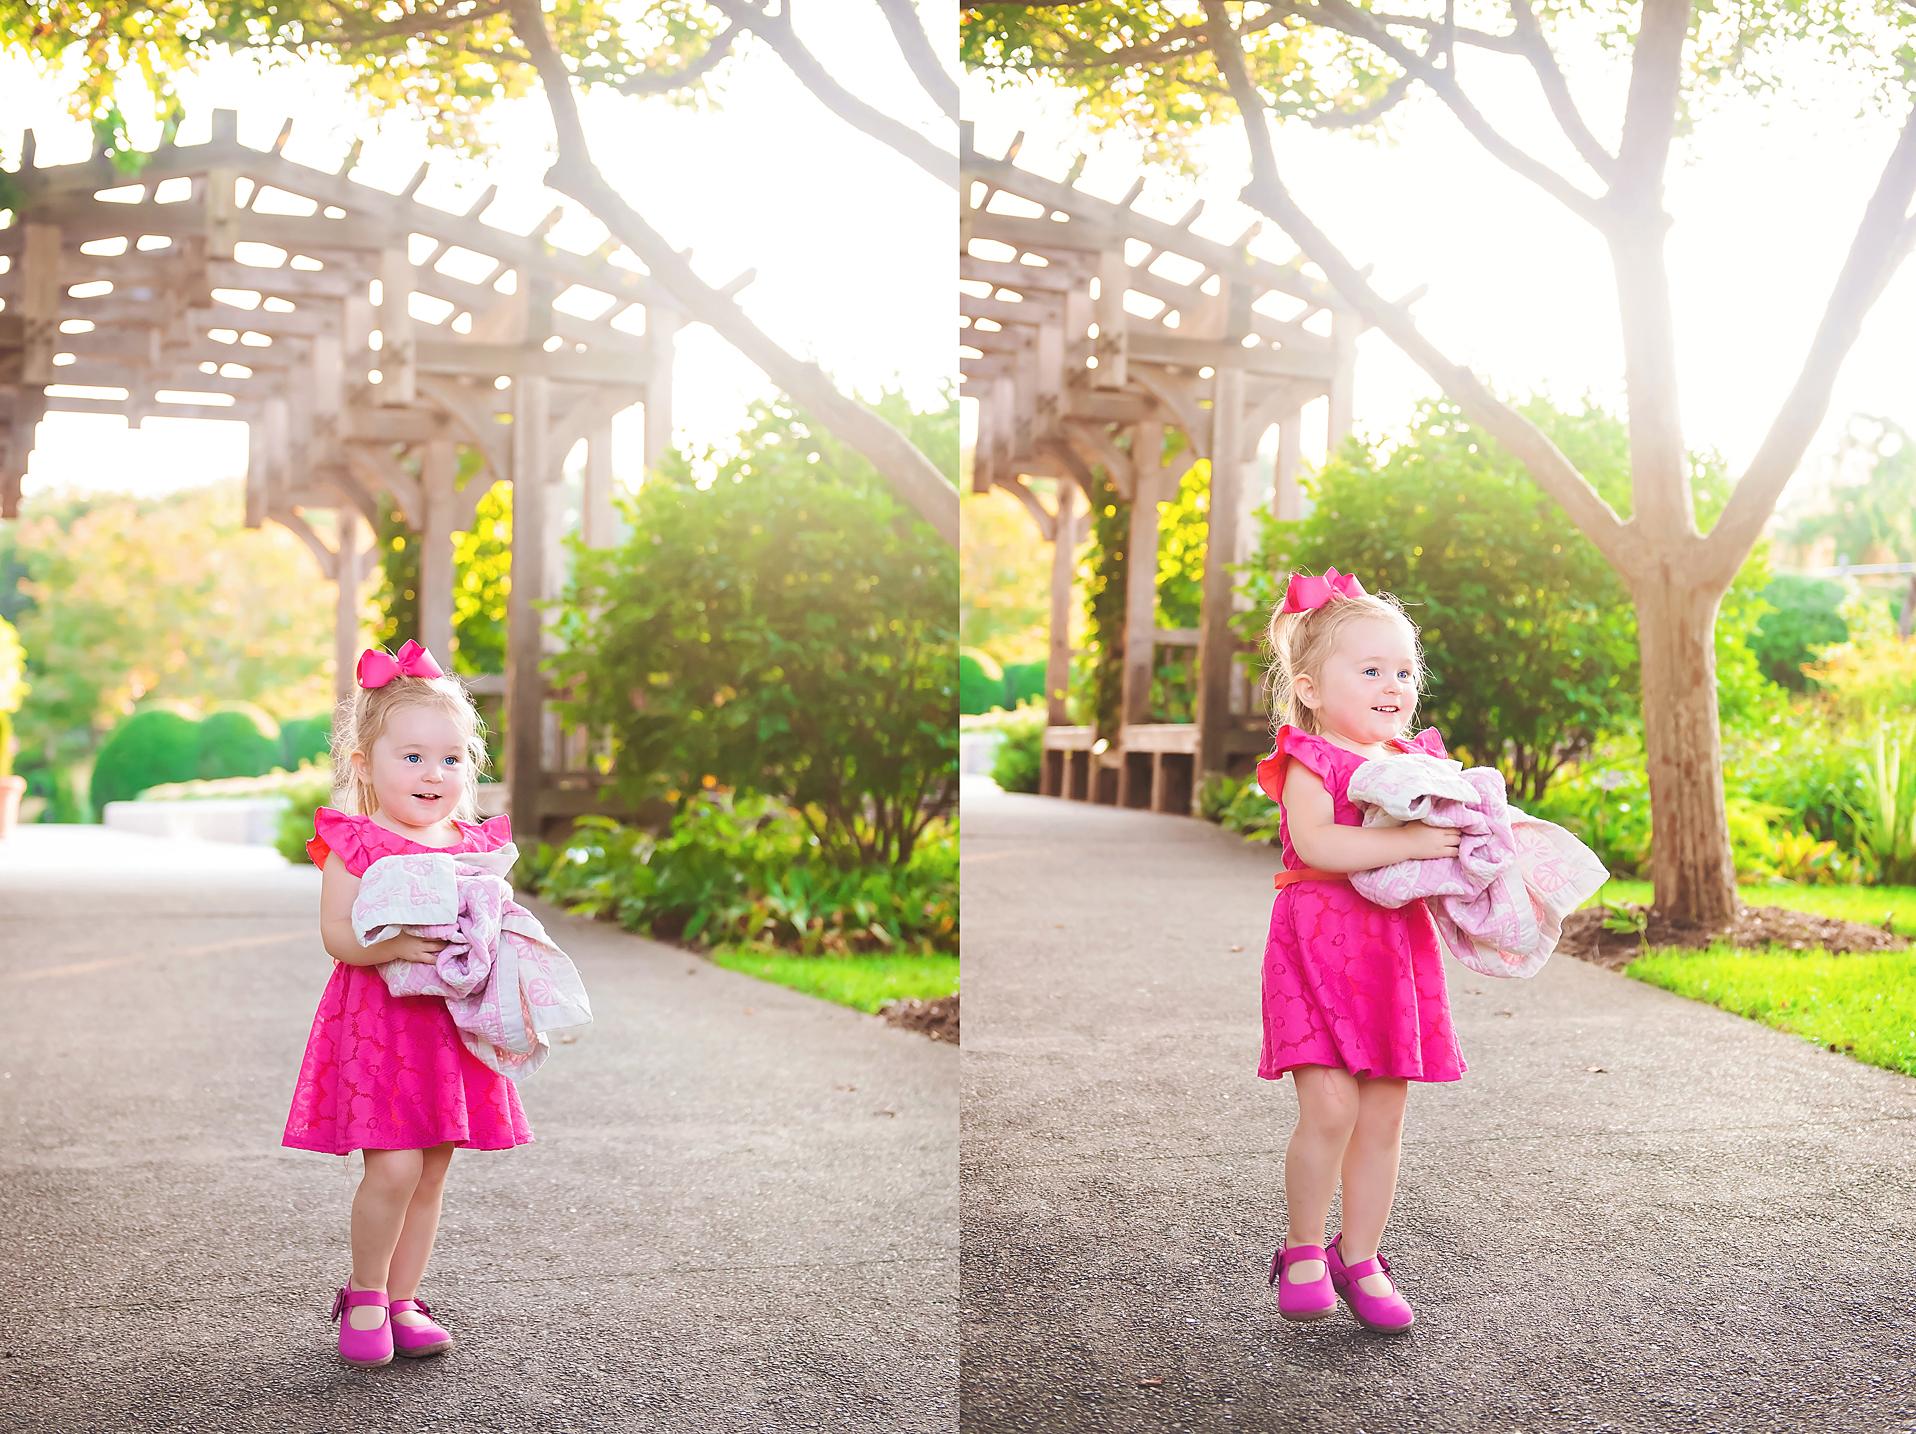 candid-girl-posing